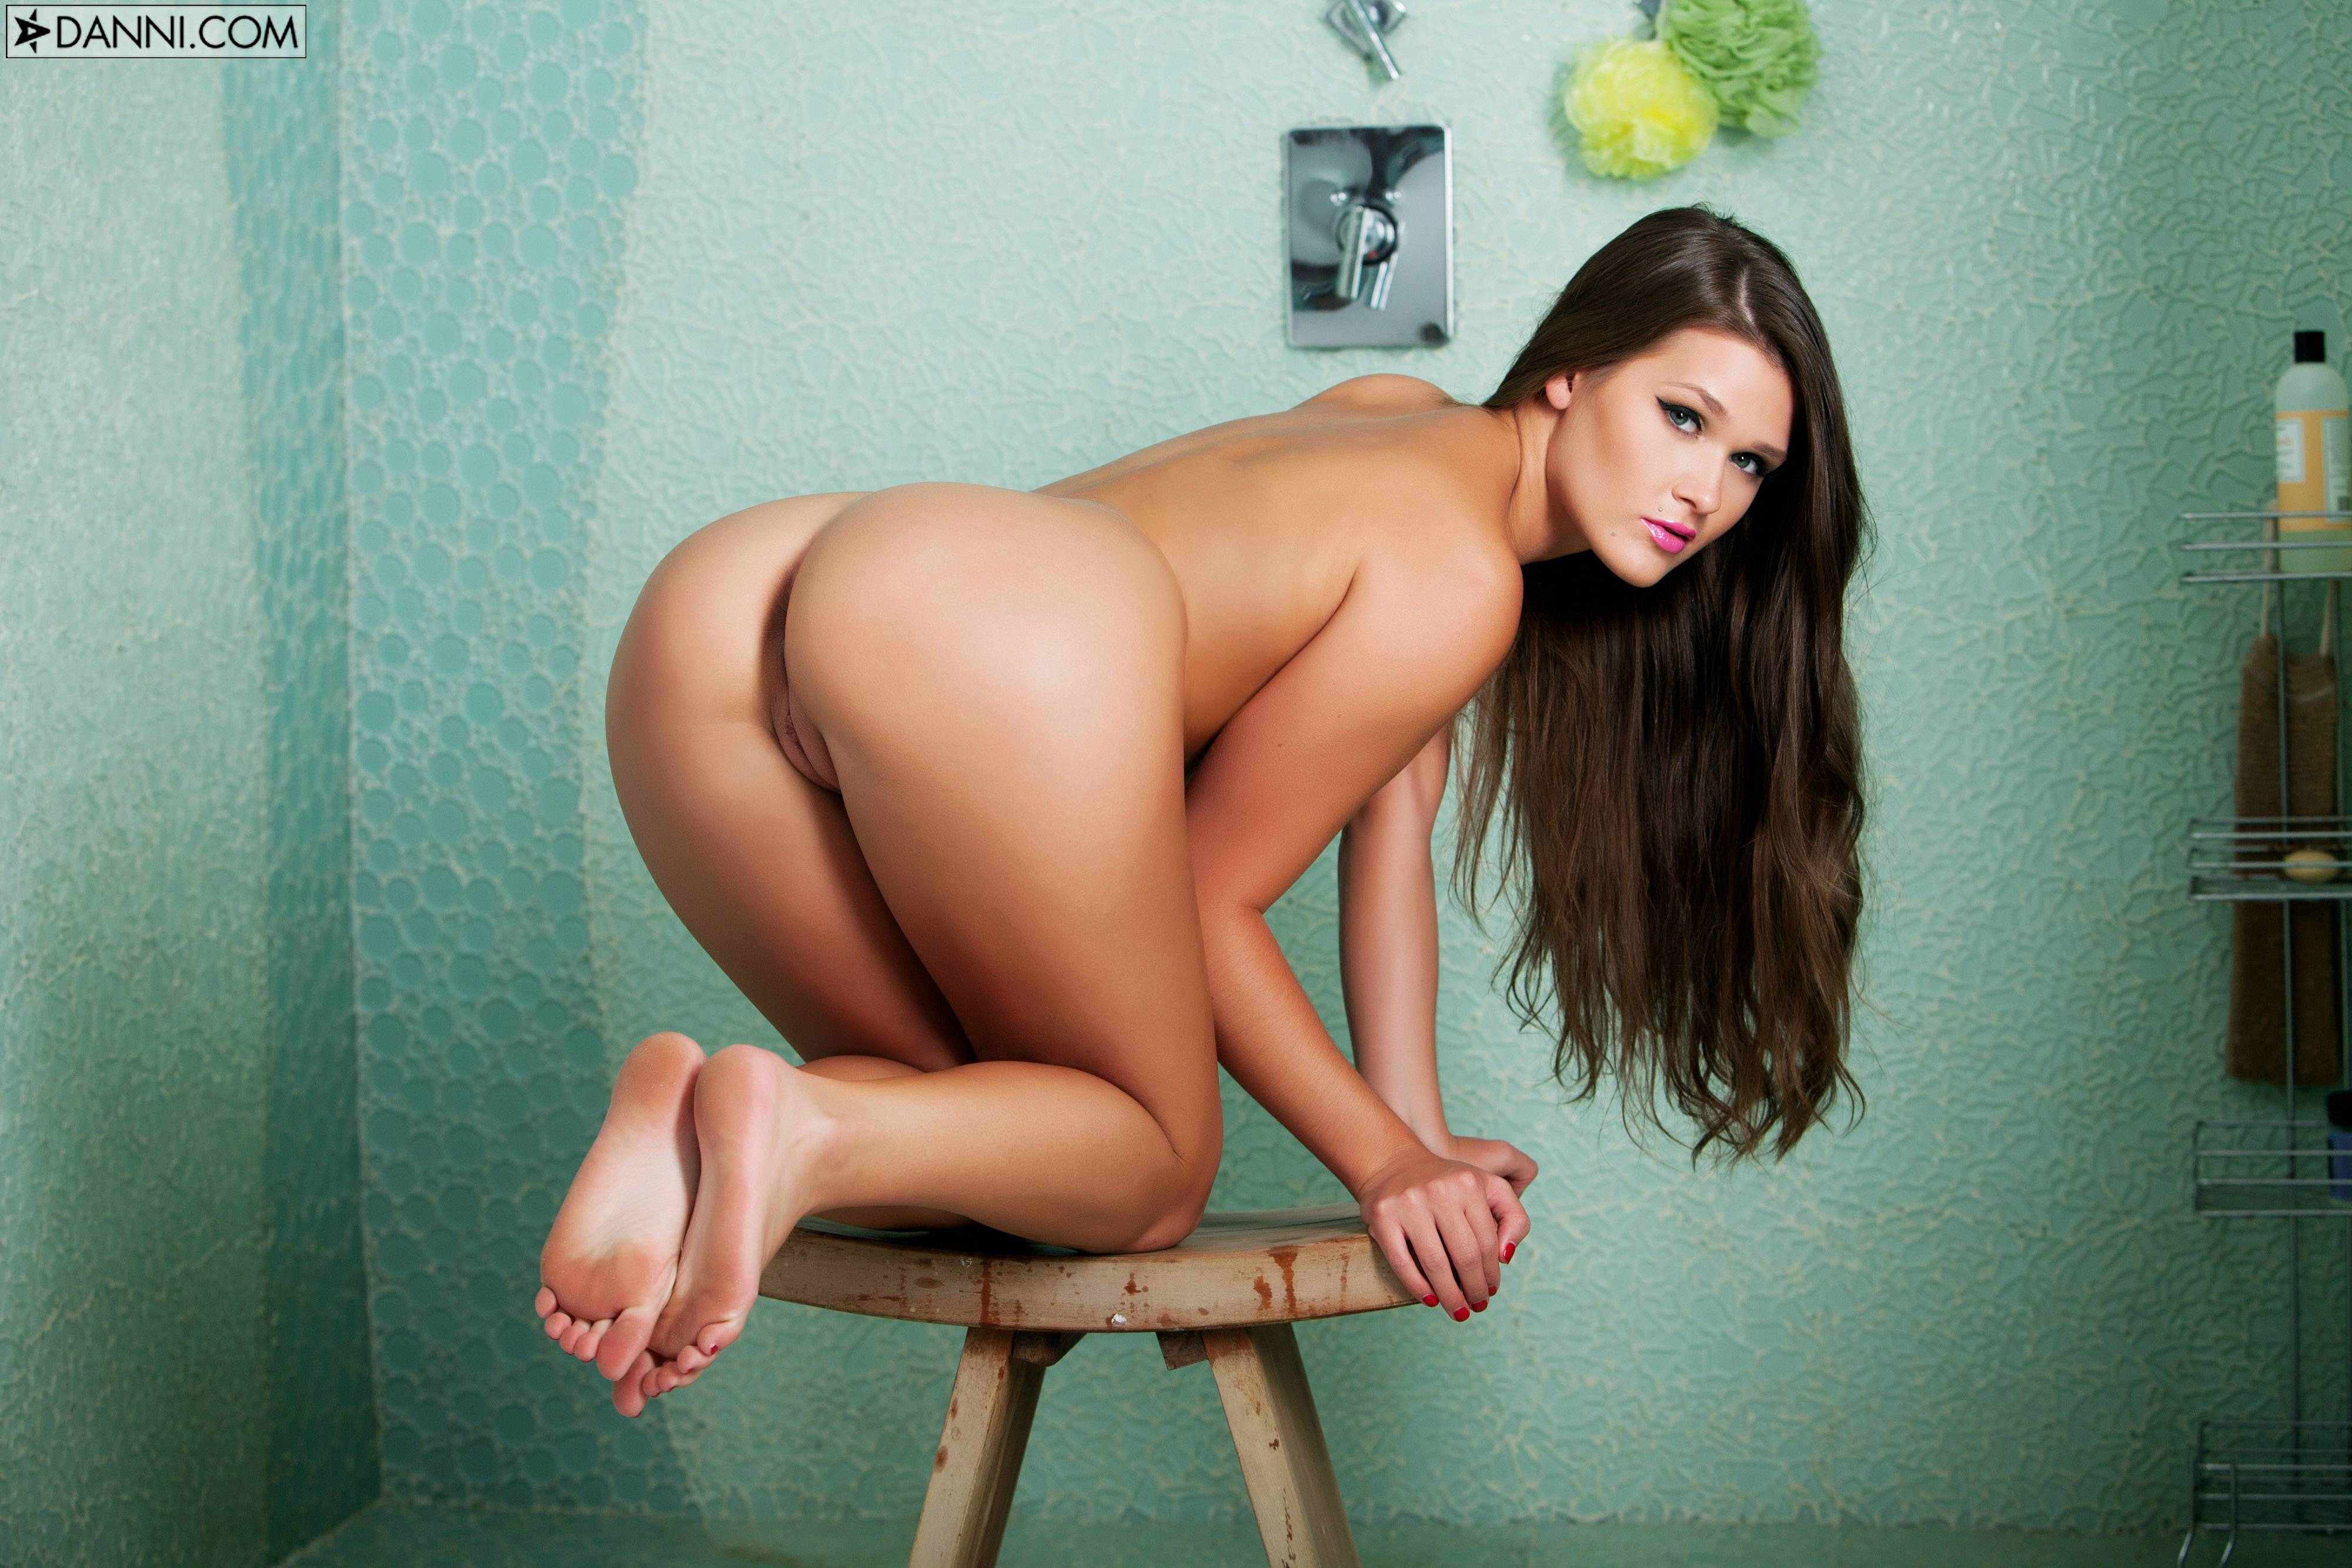 Abby Caprice Porno abby cross porn pic - eporner